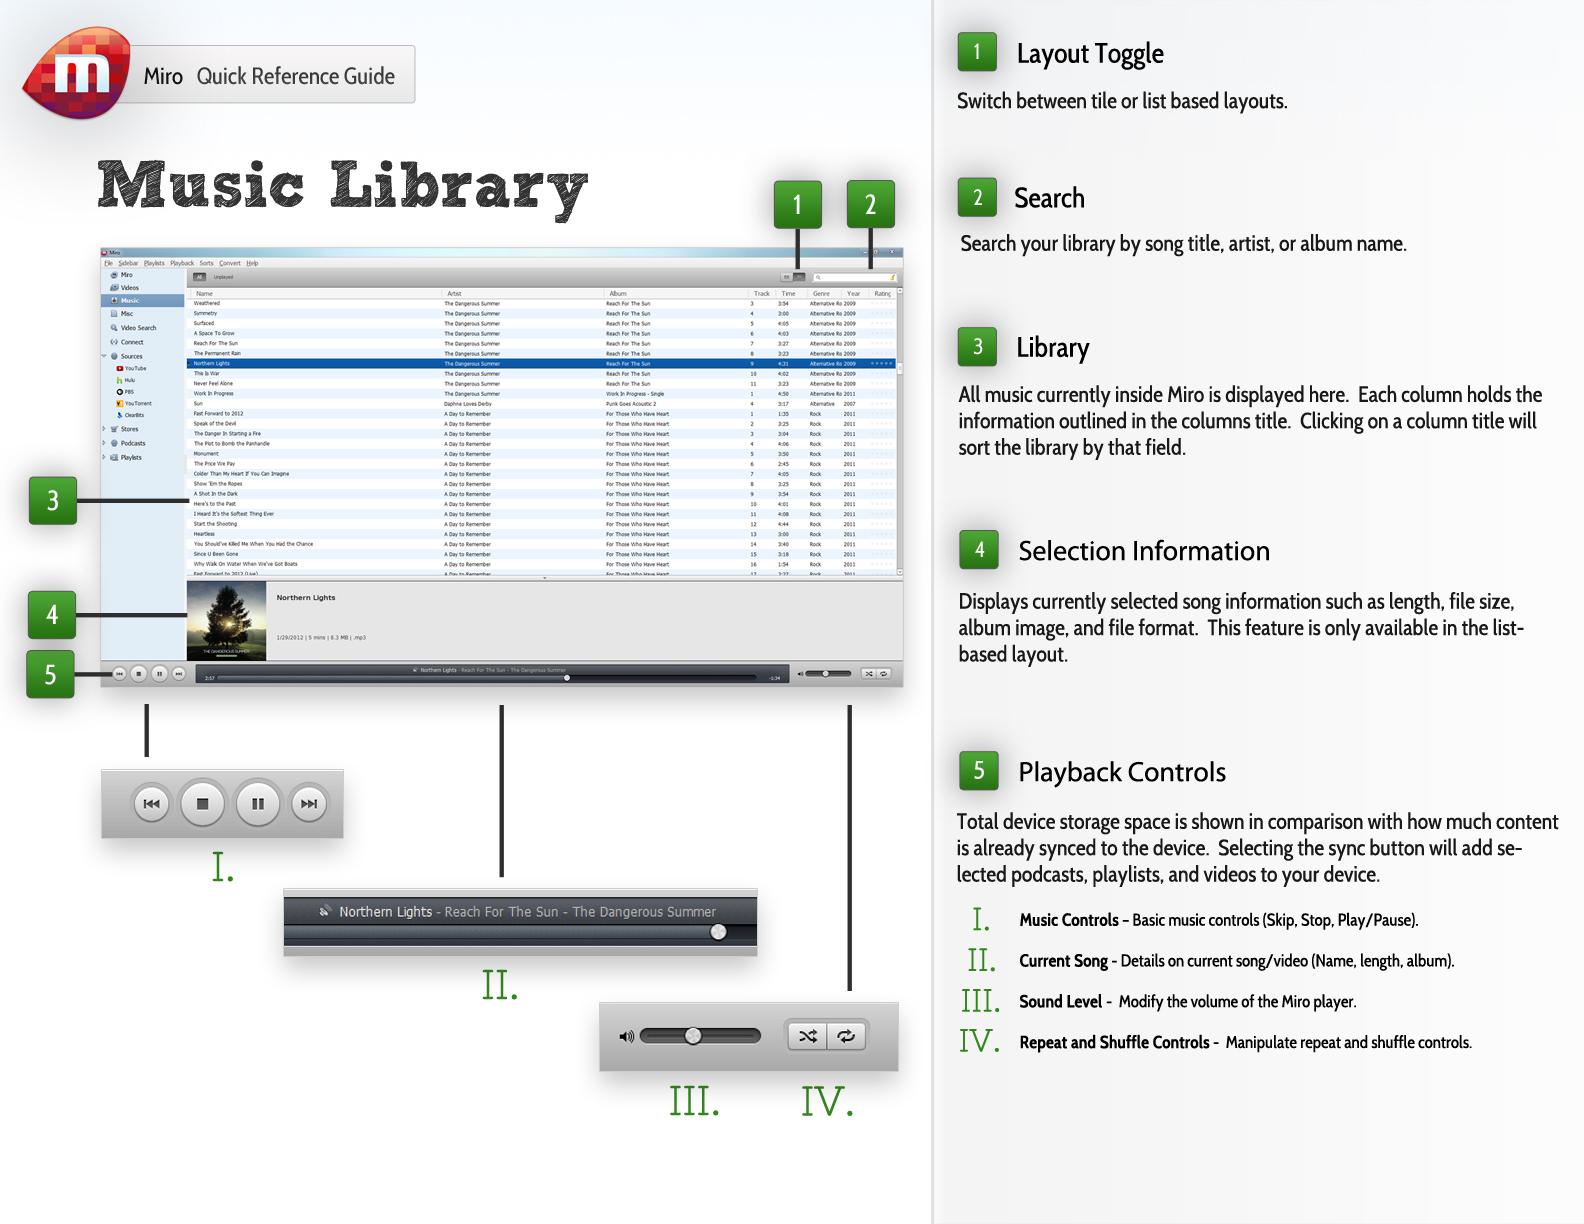 MiroQrg_Library.jpg